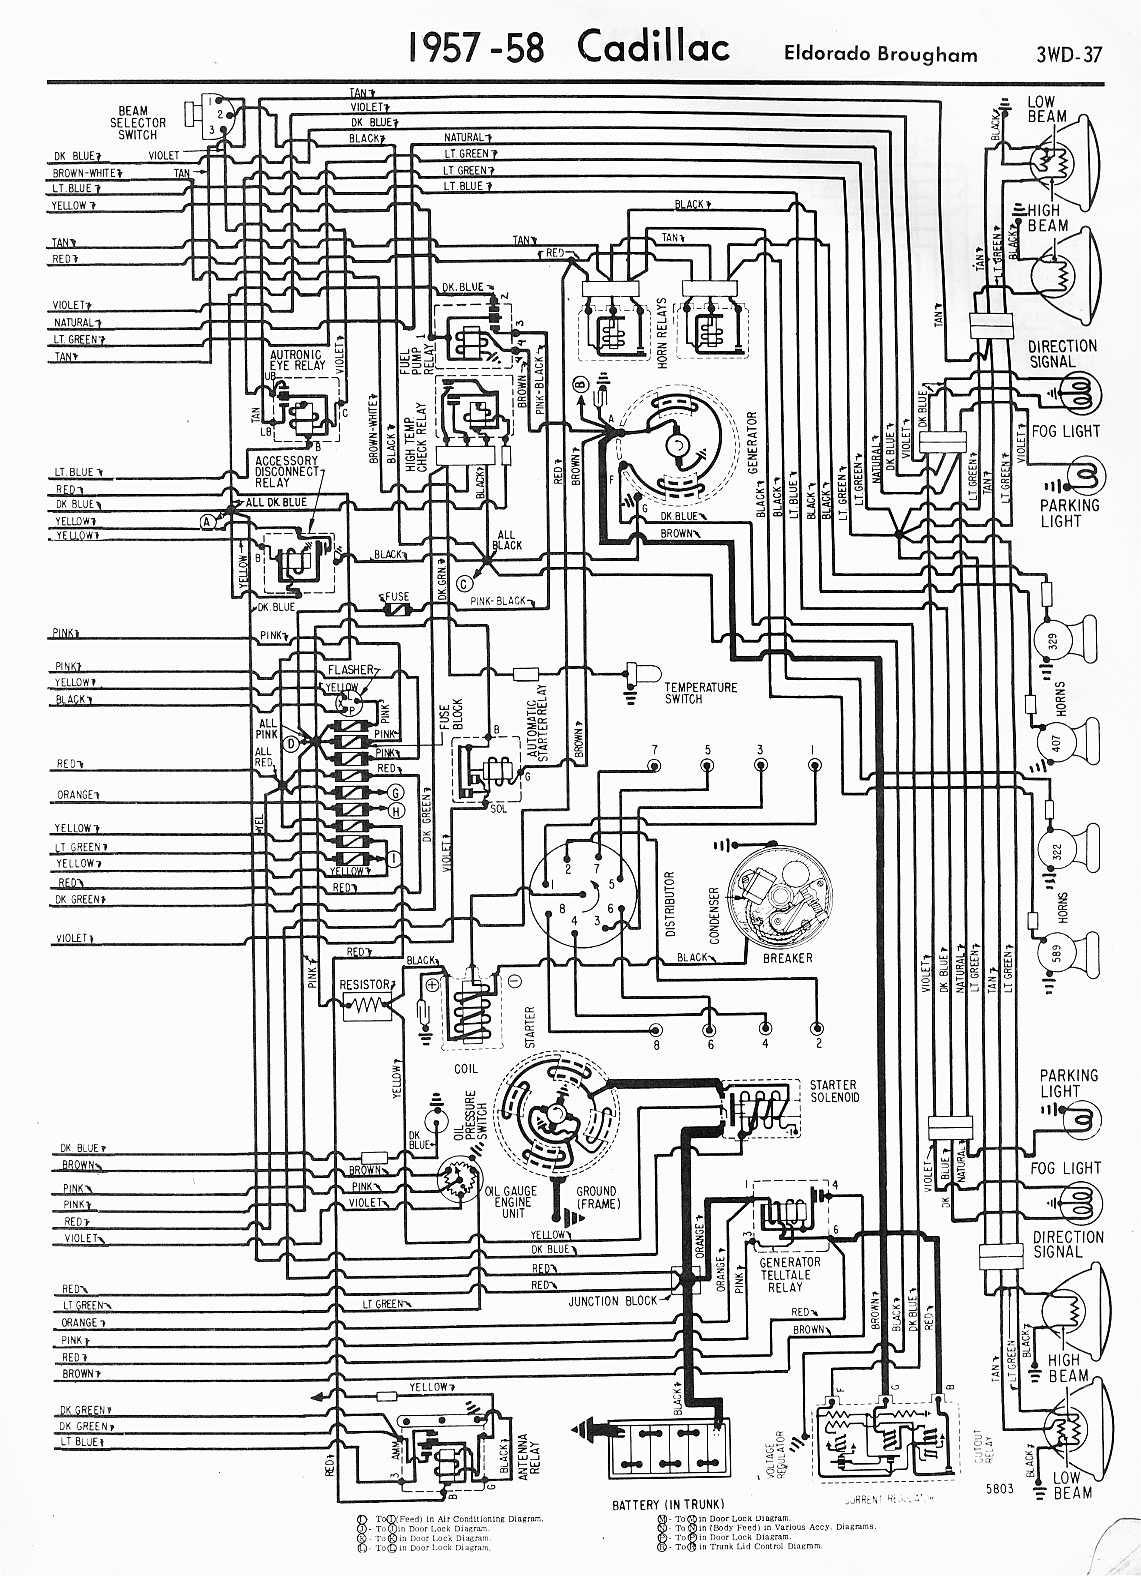 98 Cadillac Deville Wiring Diagram - Wiring Diagram